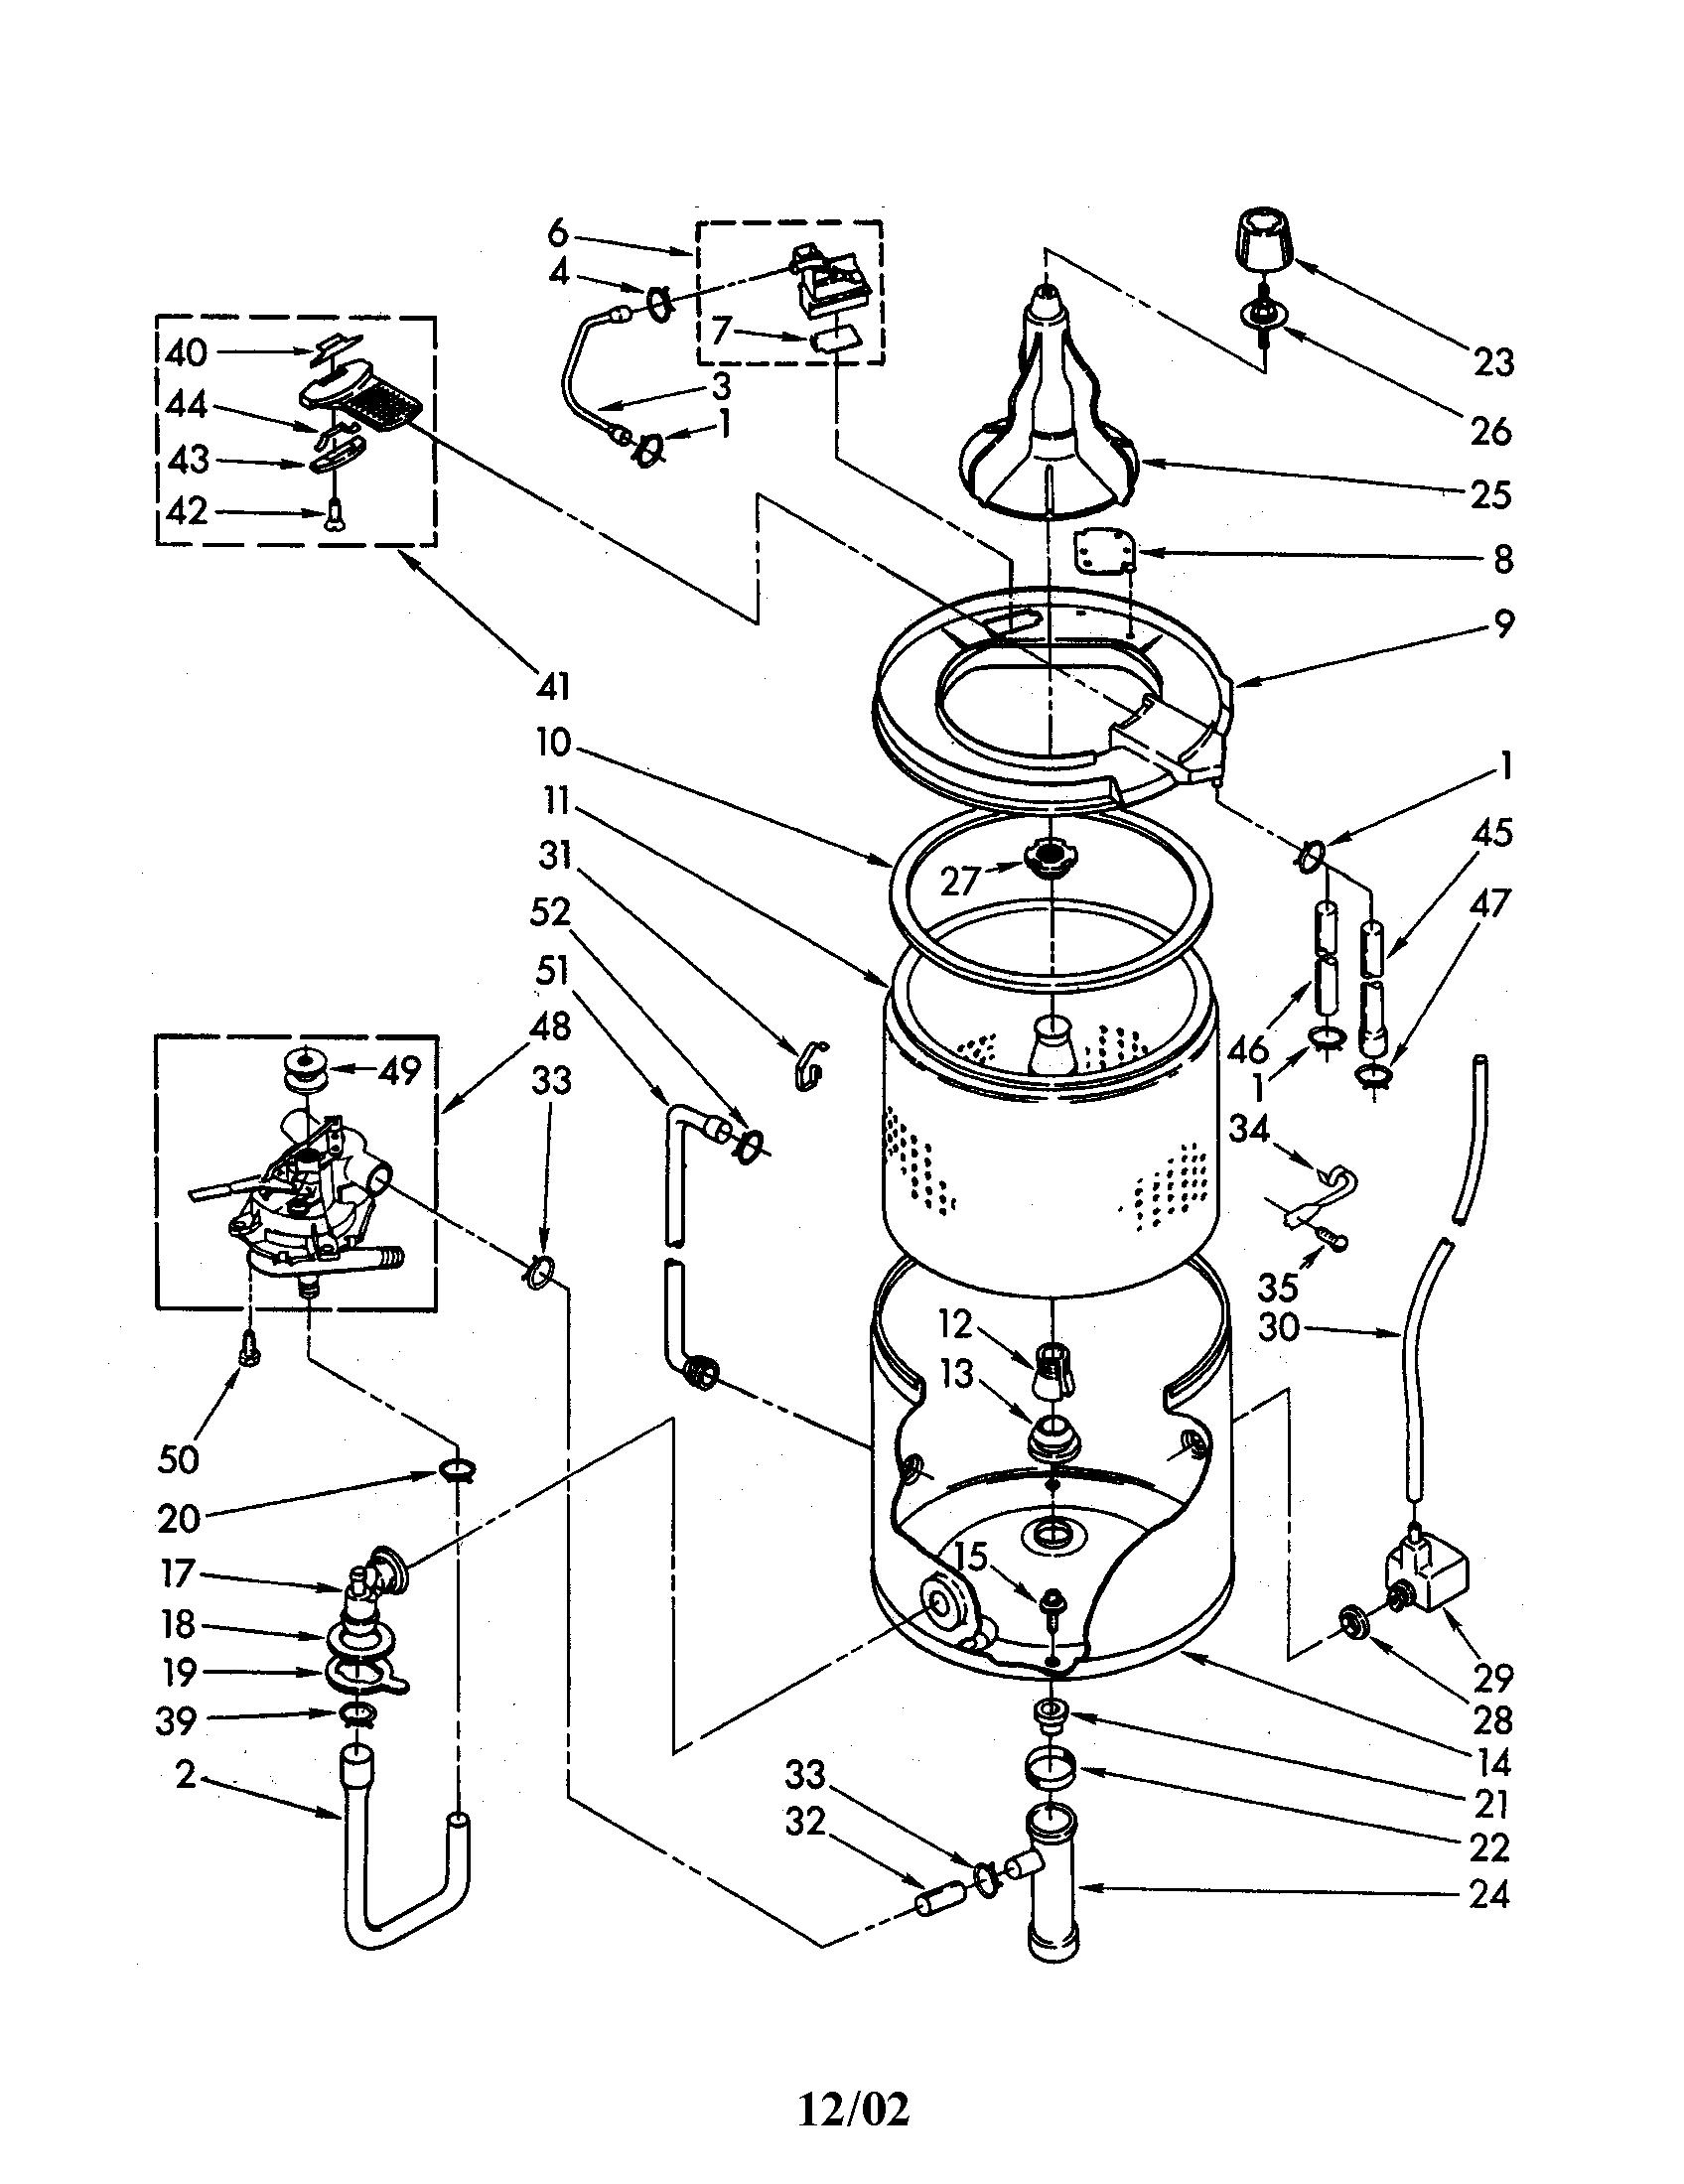 Kenmore Washer Transmission Schematics Electrolux Washer